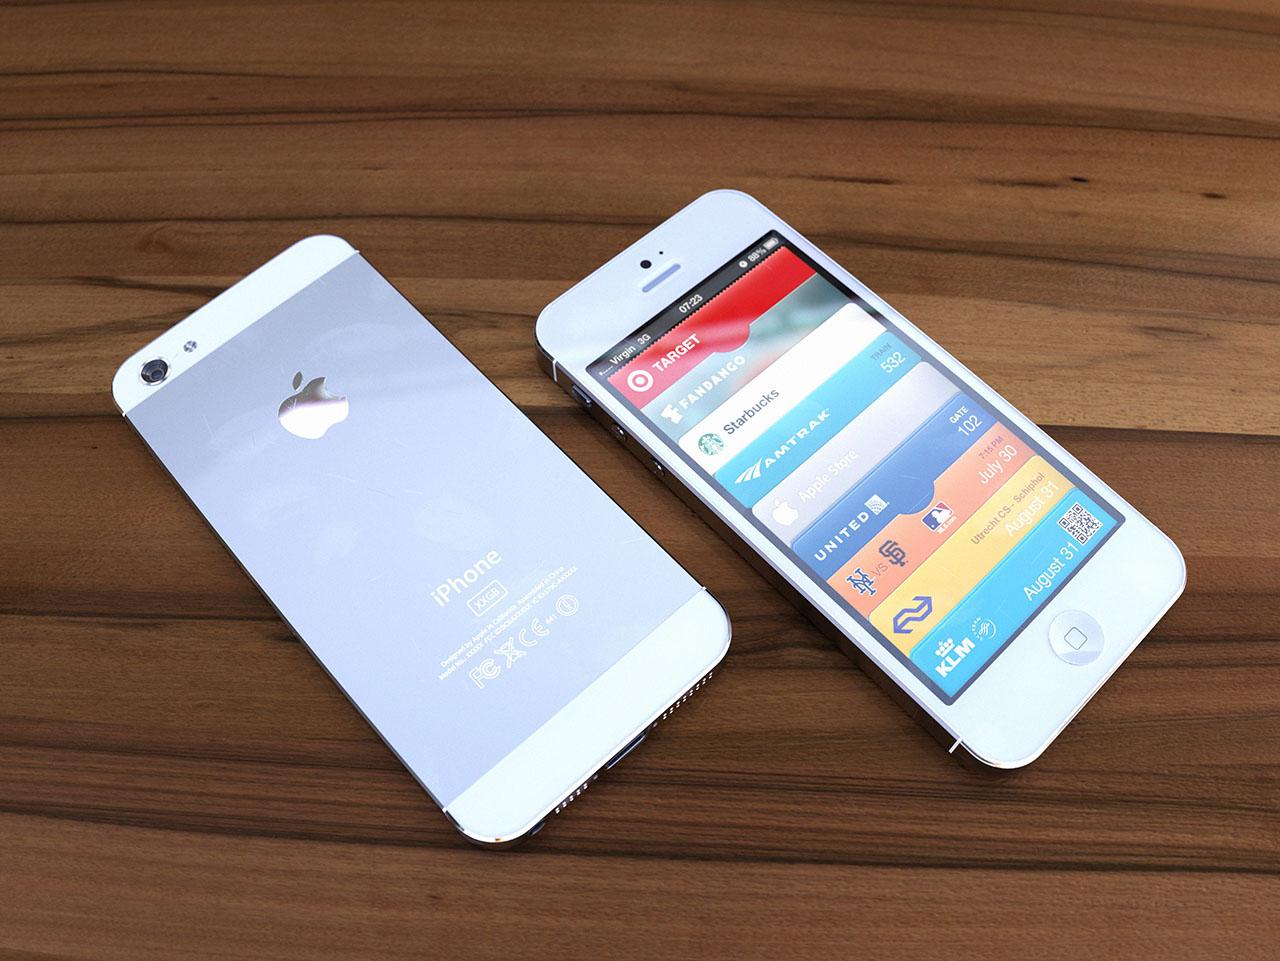 Render 3D de um novo iPhone branco - mockup